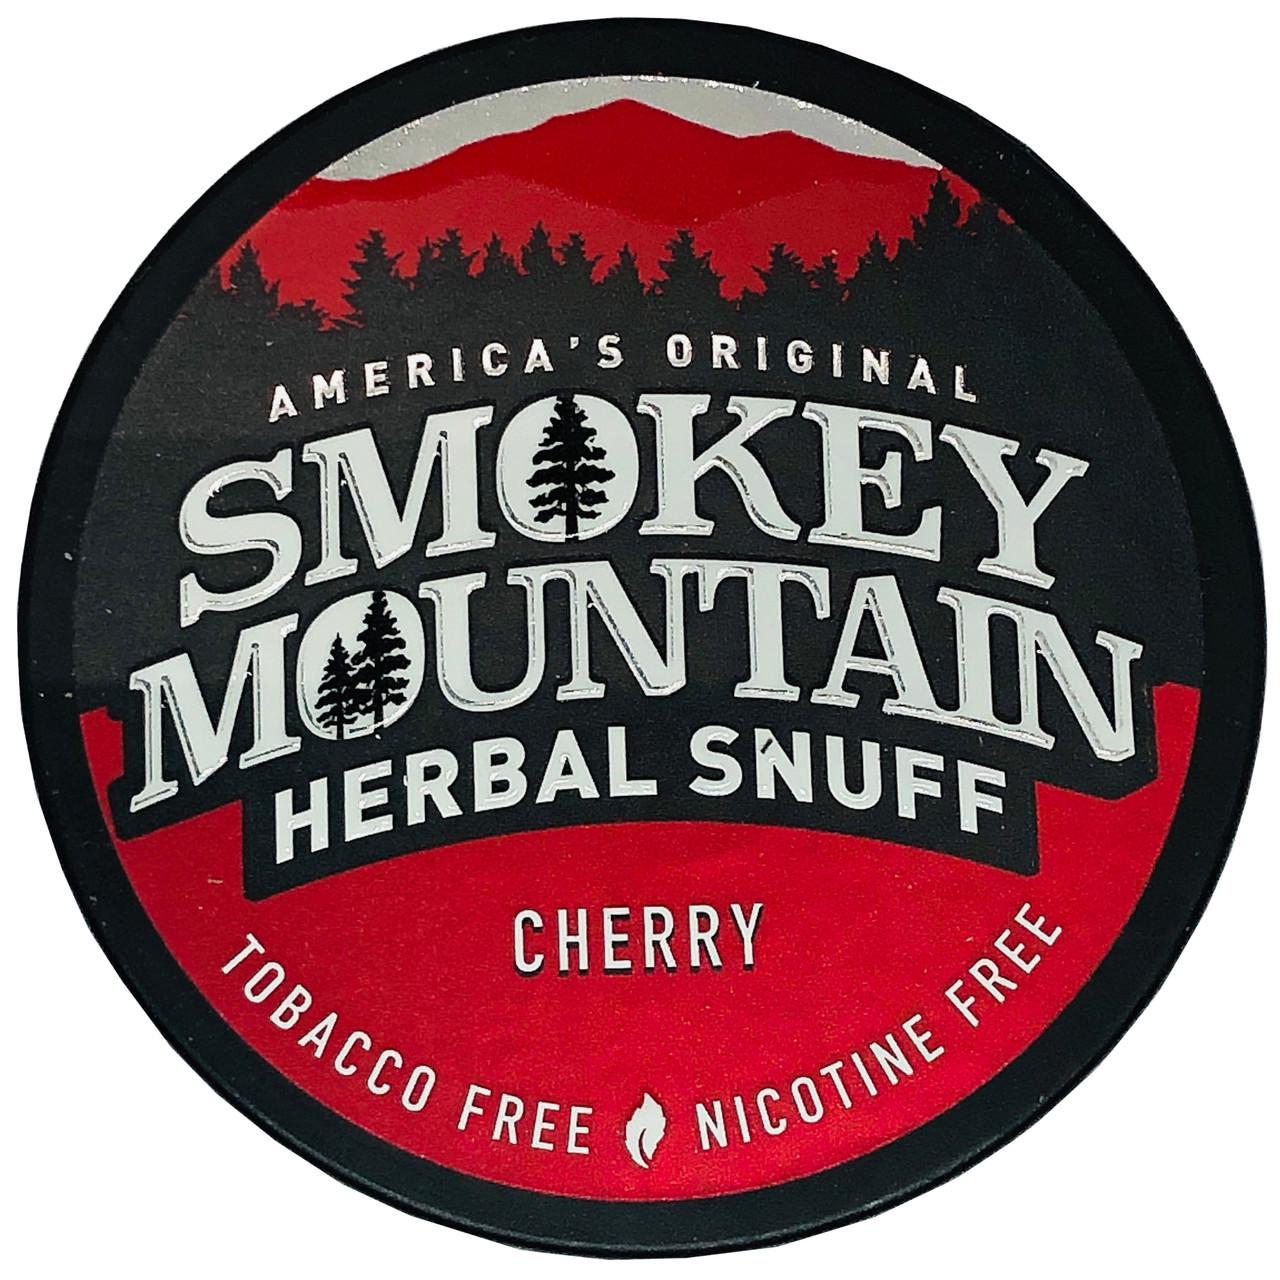 Smokey Mountain Cherry Herbal Snuff 1 Can